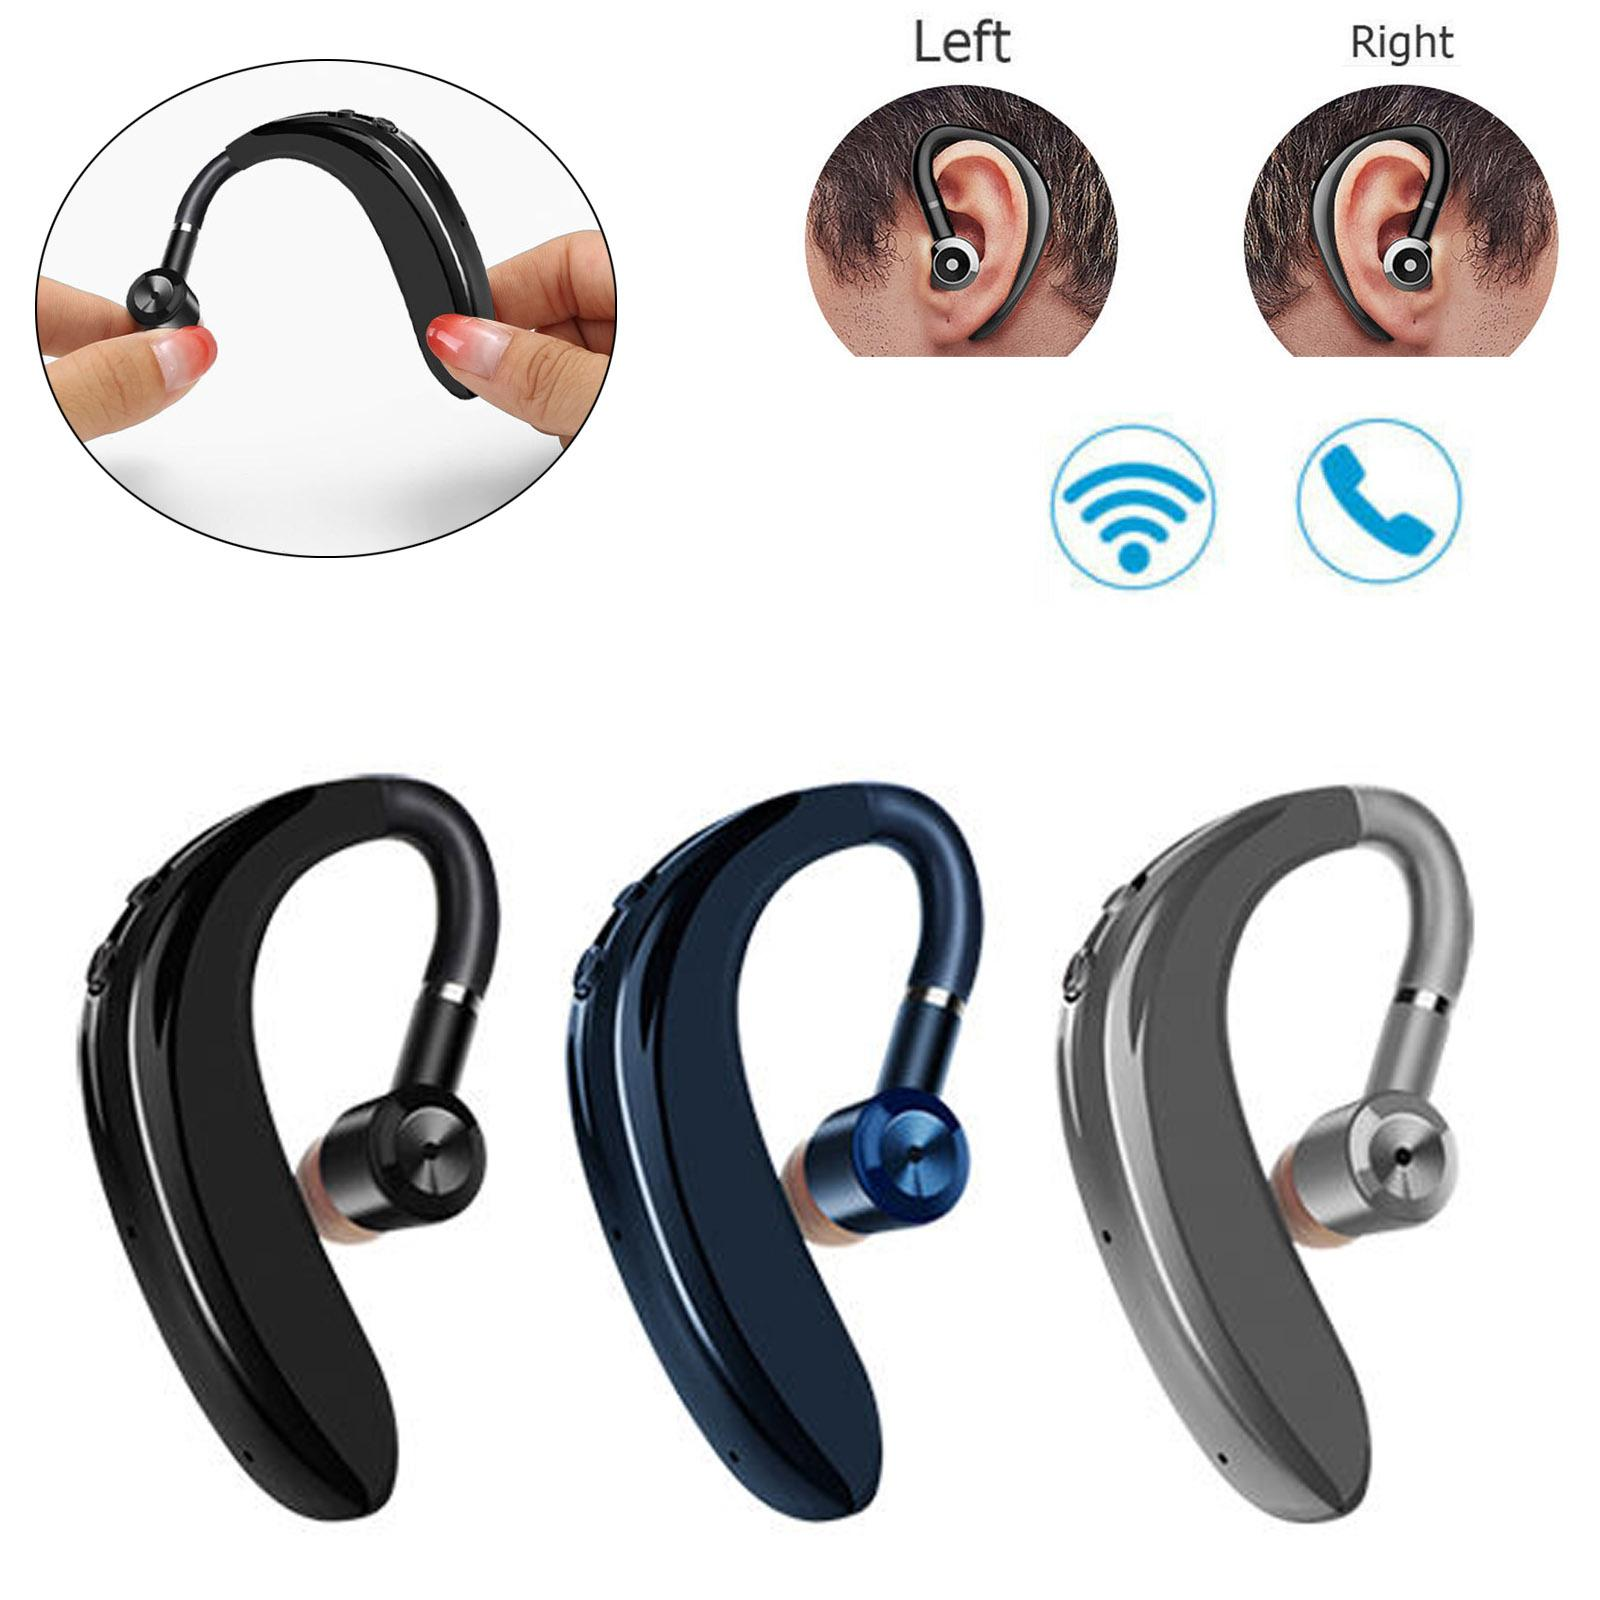 Wireless Bluetooth Headphone Sport Earphone Stereo Headset Hadsfree Calling For Samsung S10 S9 S8 Iphone Motorola E G Lg V40 V30 Bluetooth Earphones Headphones Aliexpress